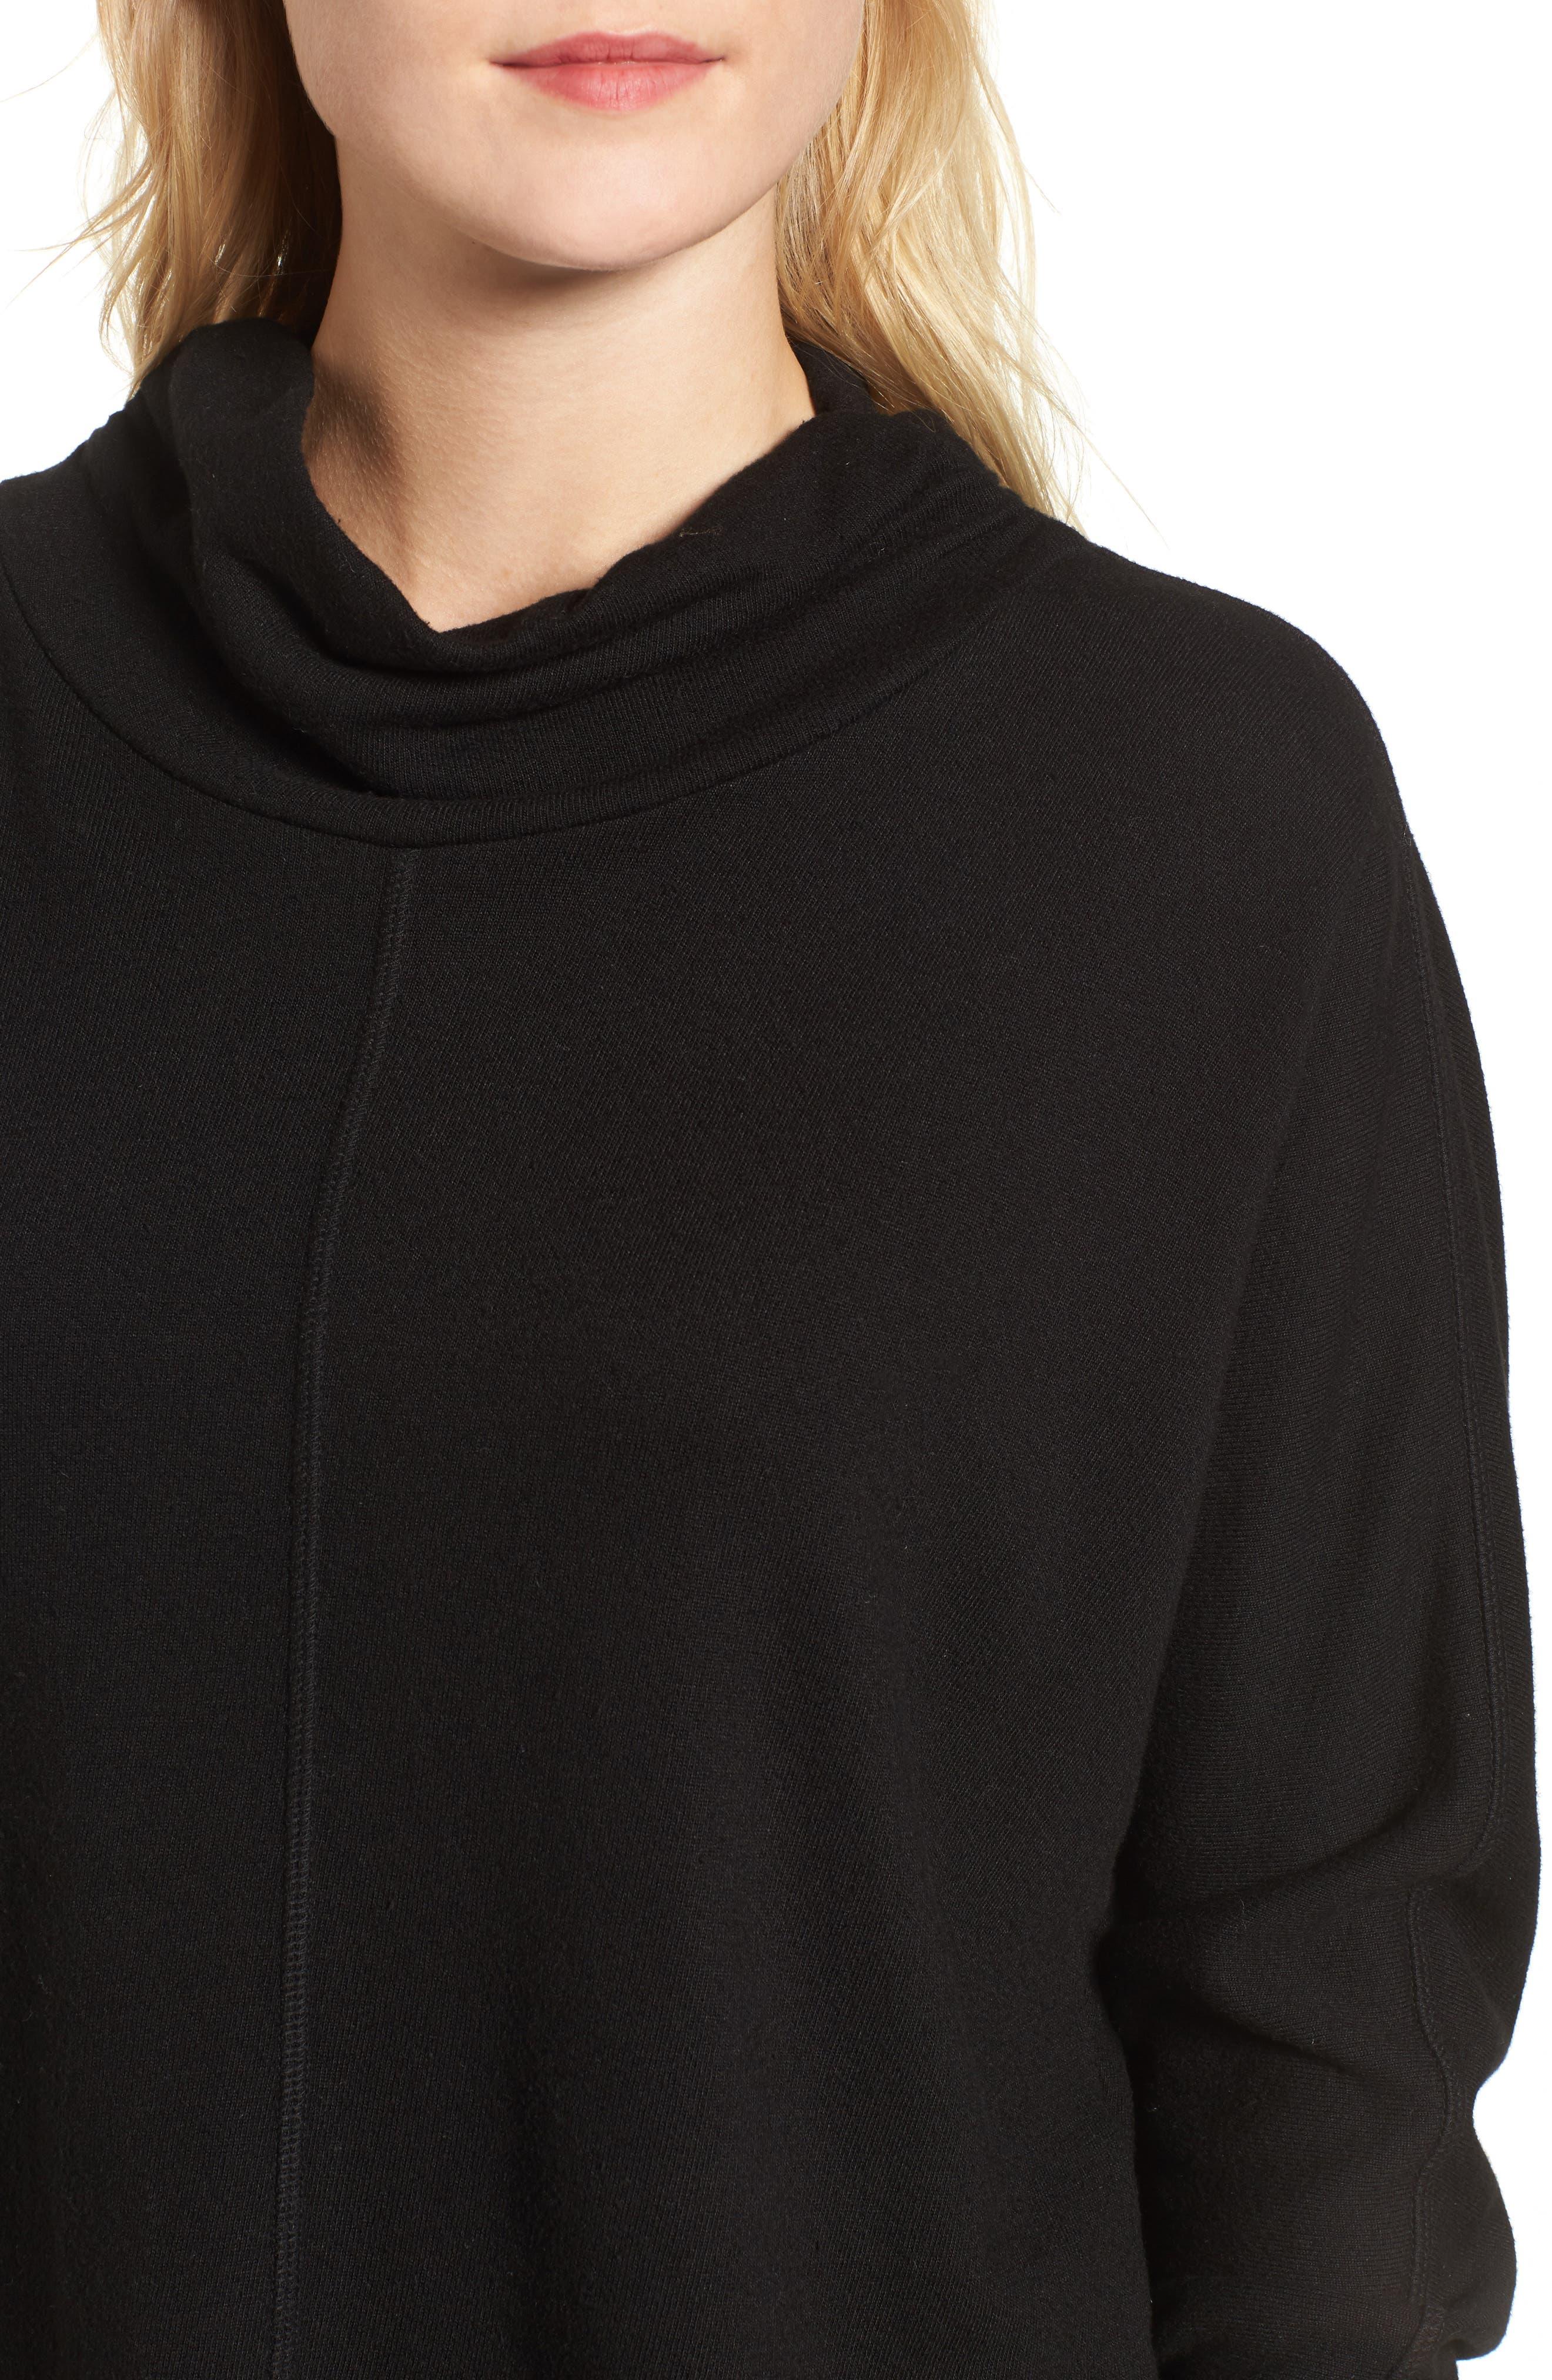 Helix Turtleneck Sweatshirt,                             Alternate thumbnail 4, color,                             001